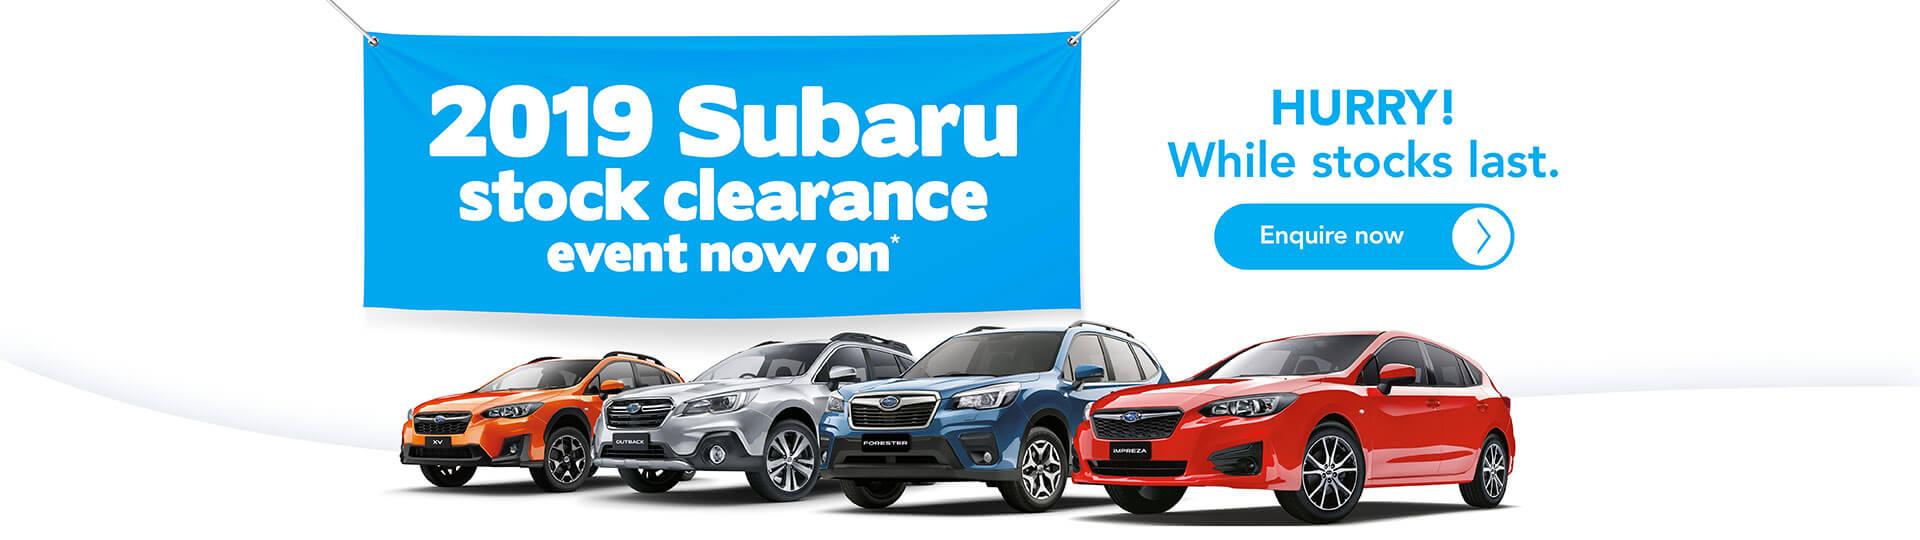 Crick Auto Group Subaru Offers